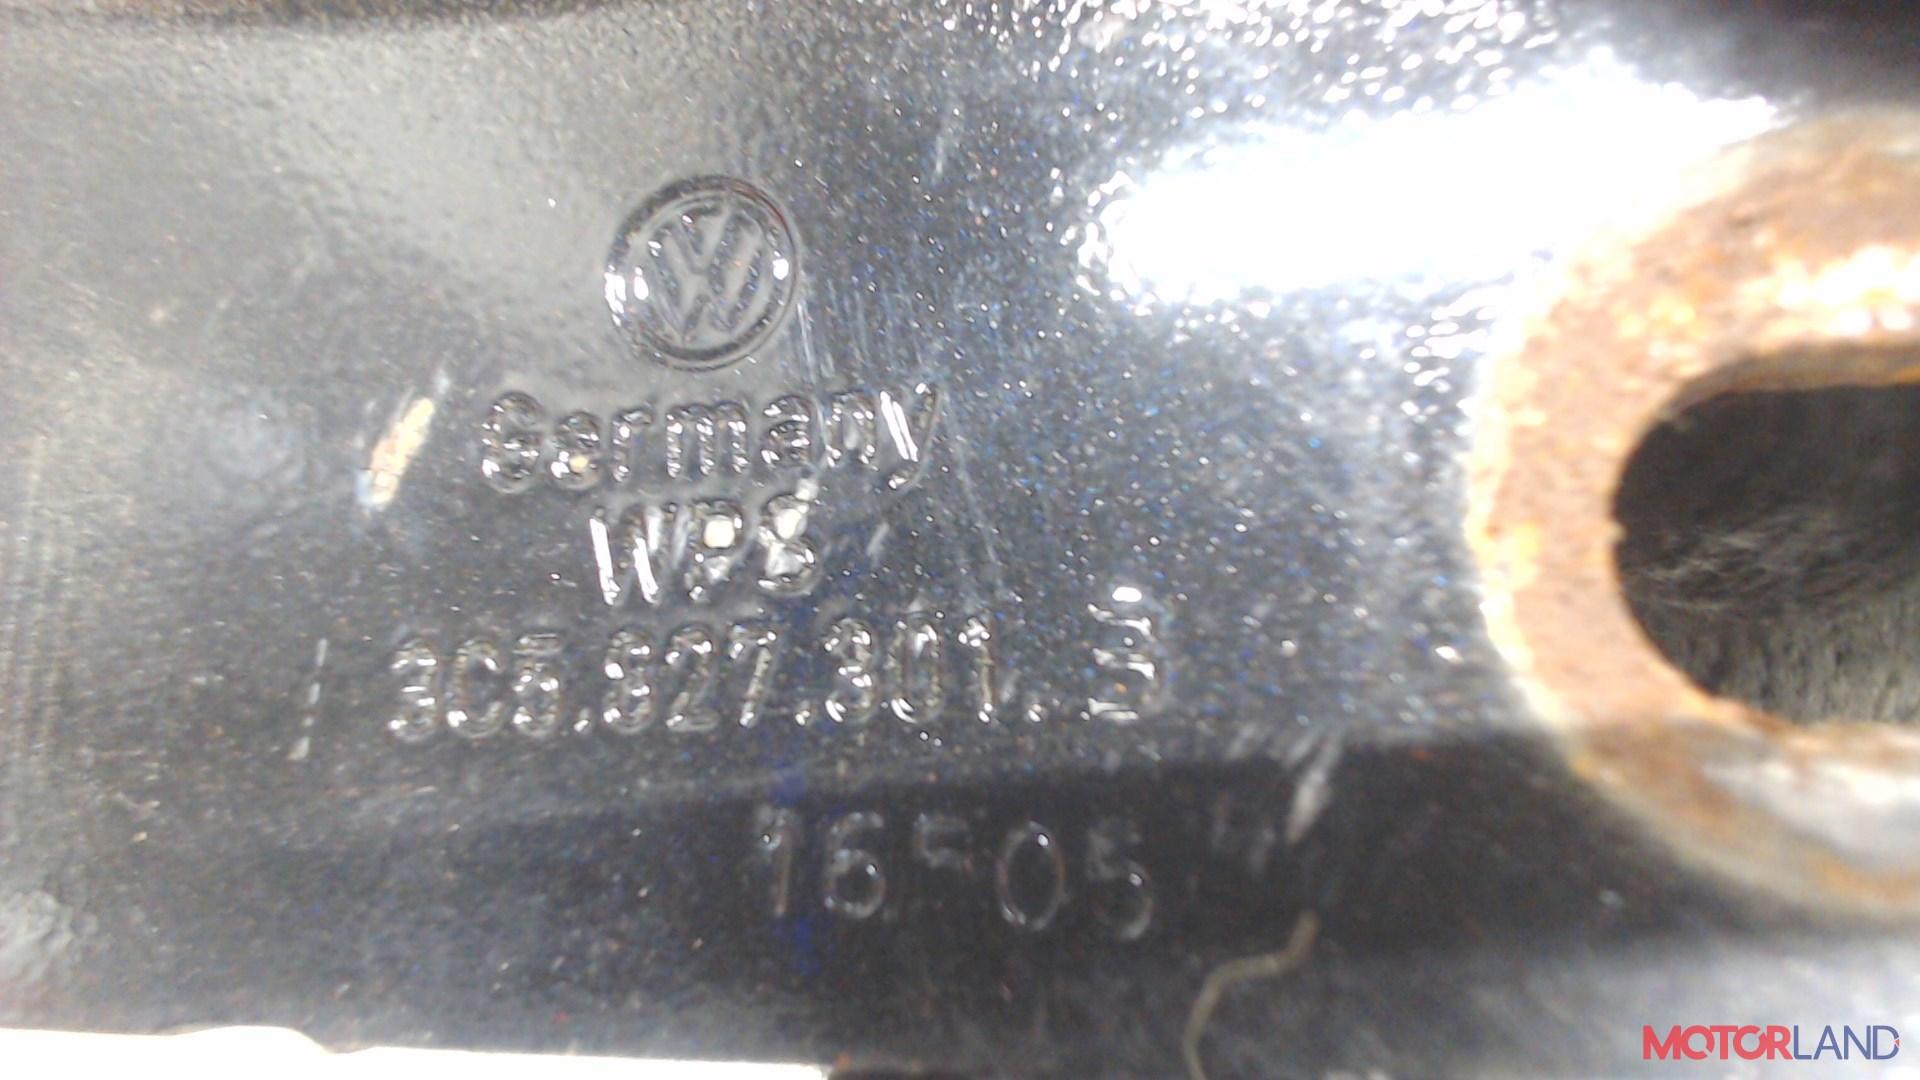 Петля крышки багажника Volkswagen Passat 6 2005-2010 3.2 л. 2006 AXZ б/у #3